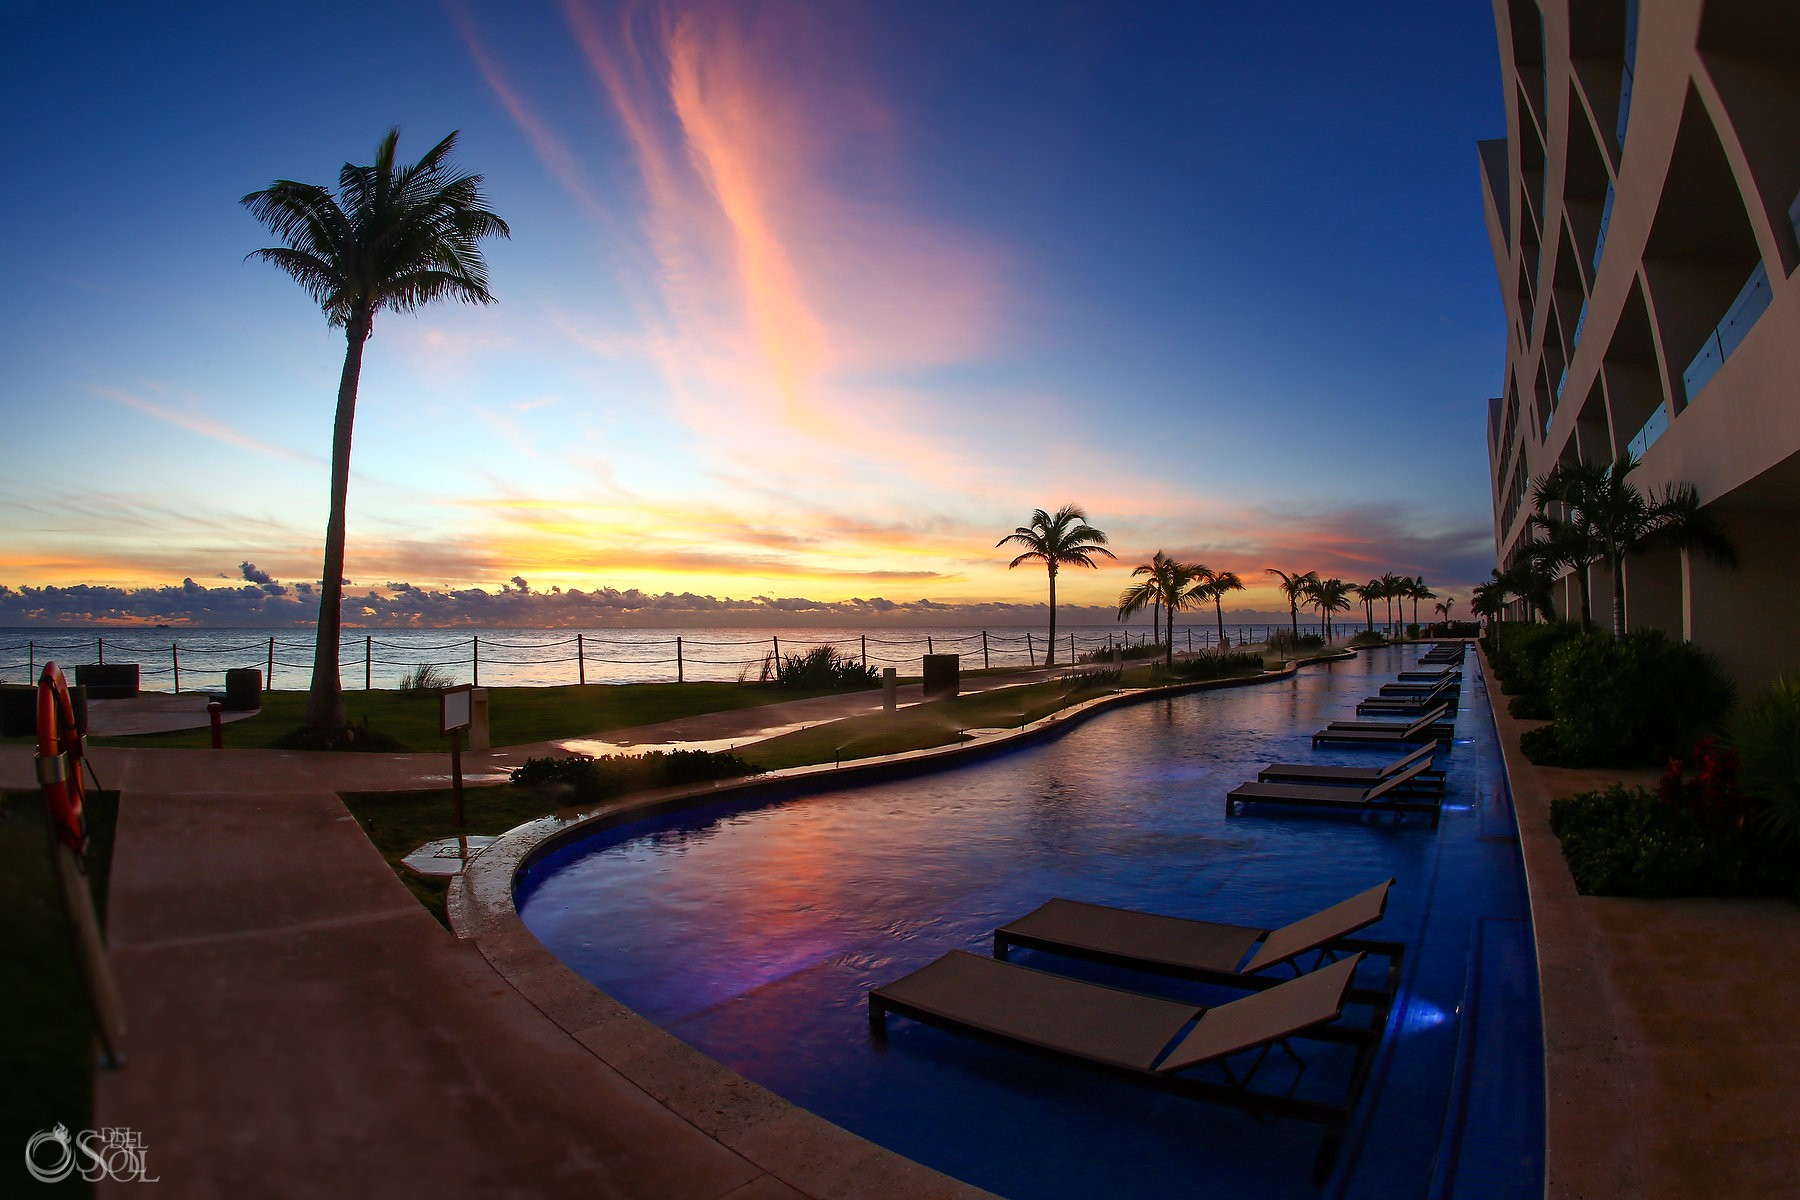 Sunset at Hyatt Ziva Cancun, Mexico del sol photography